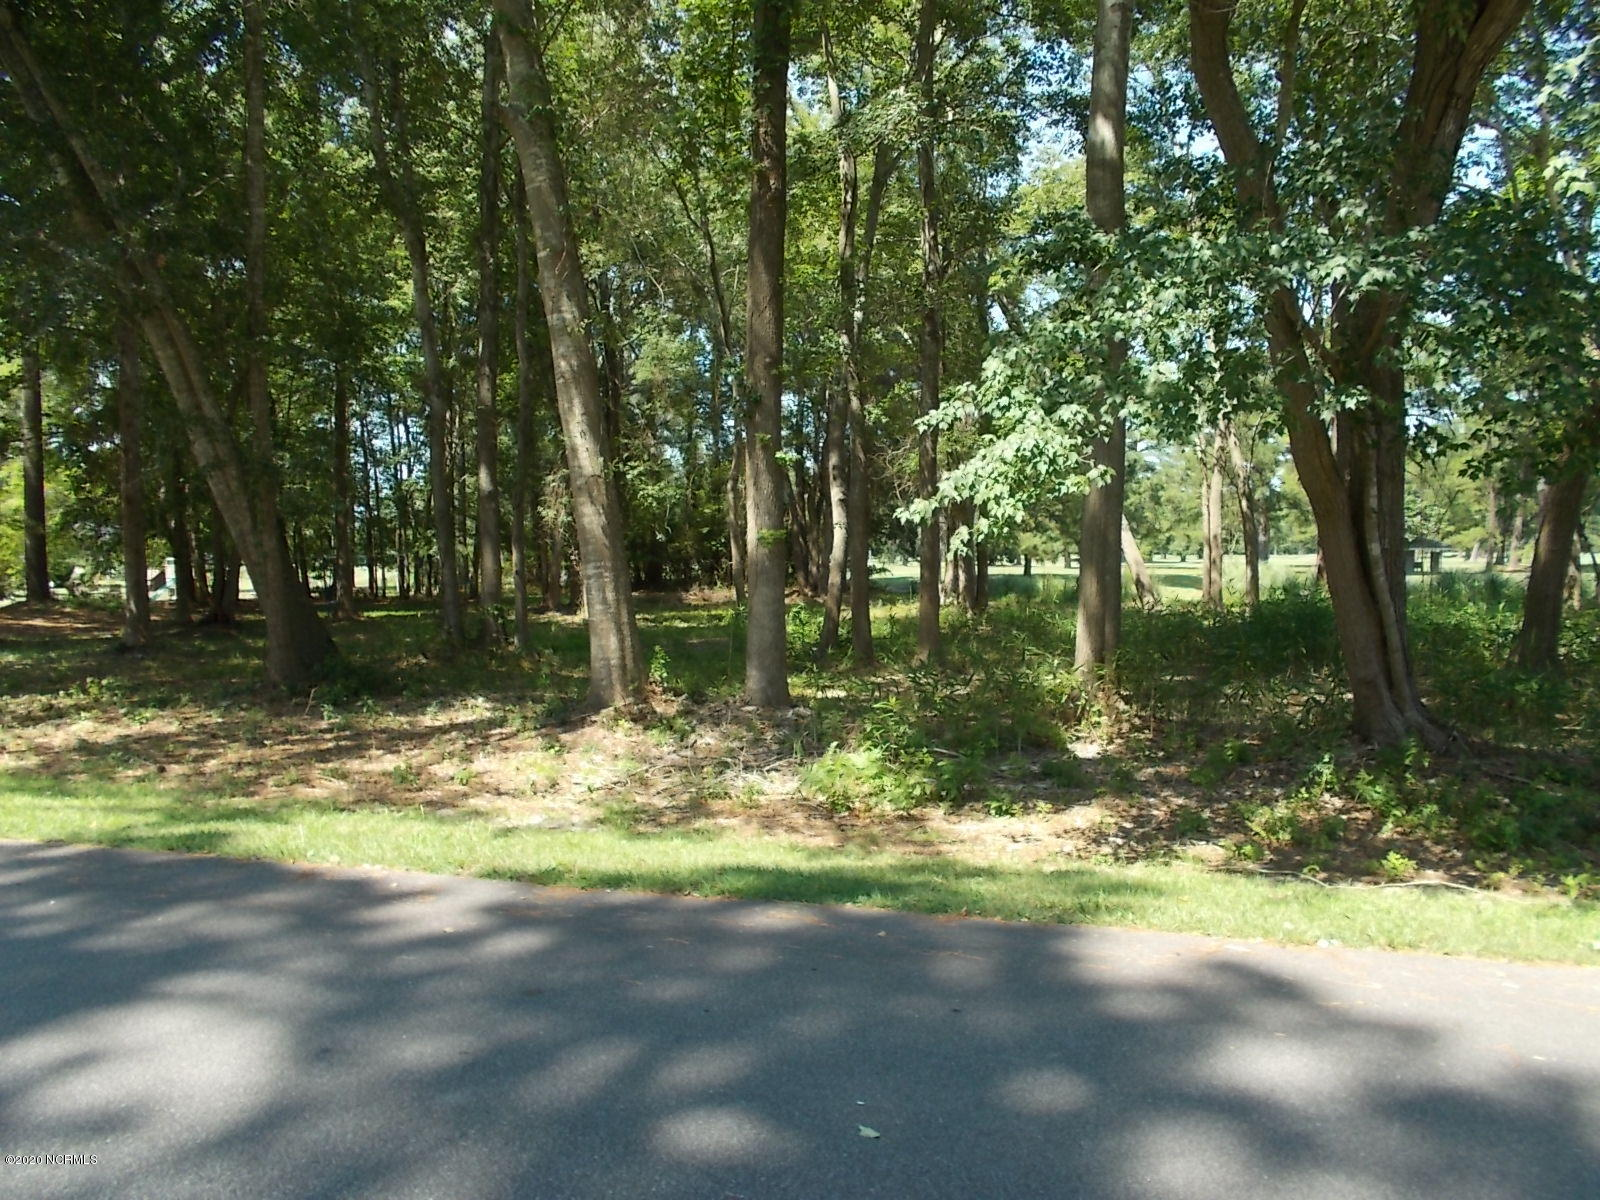 Lot 40/40a Fairway Drive, Washington, North Carolina 27889, ,Residential land,For sale,Fairway,100227886